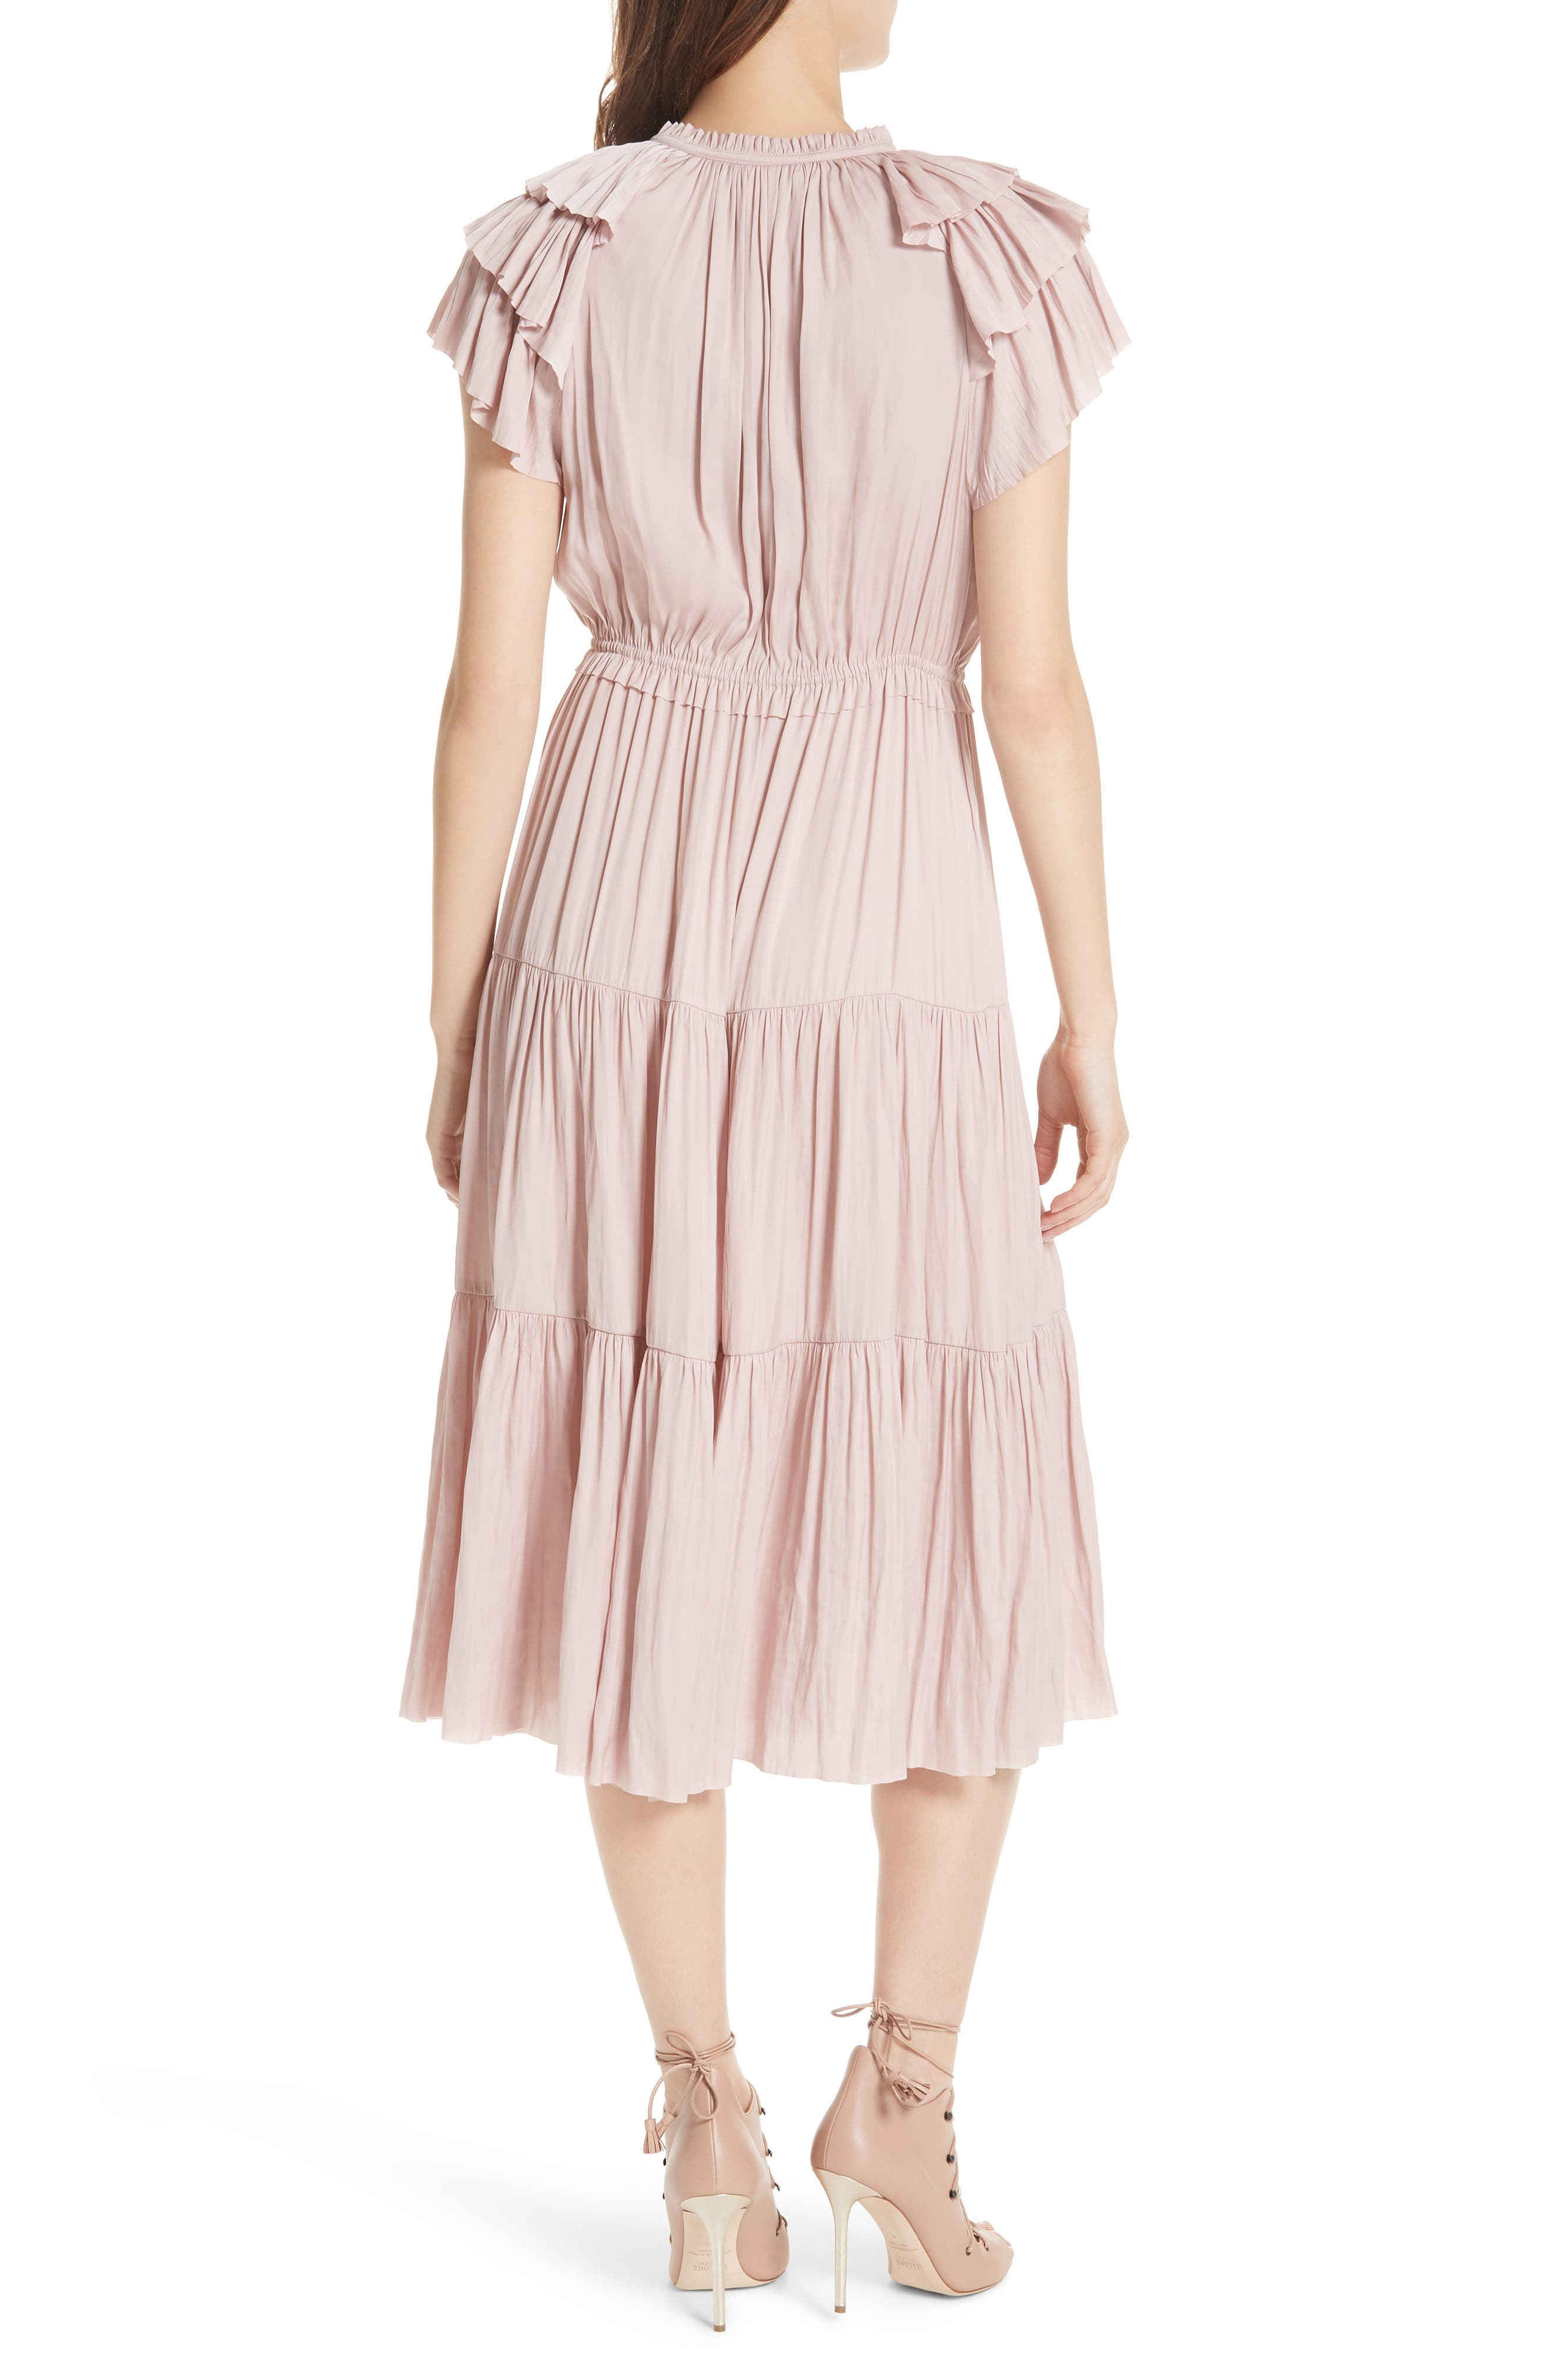 Blaire Satin Dress,                             Alternate thumbnail 2, color,                             600